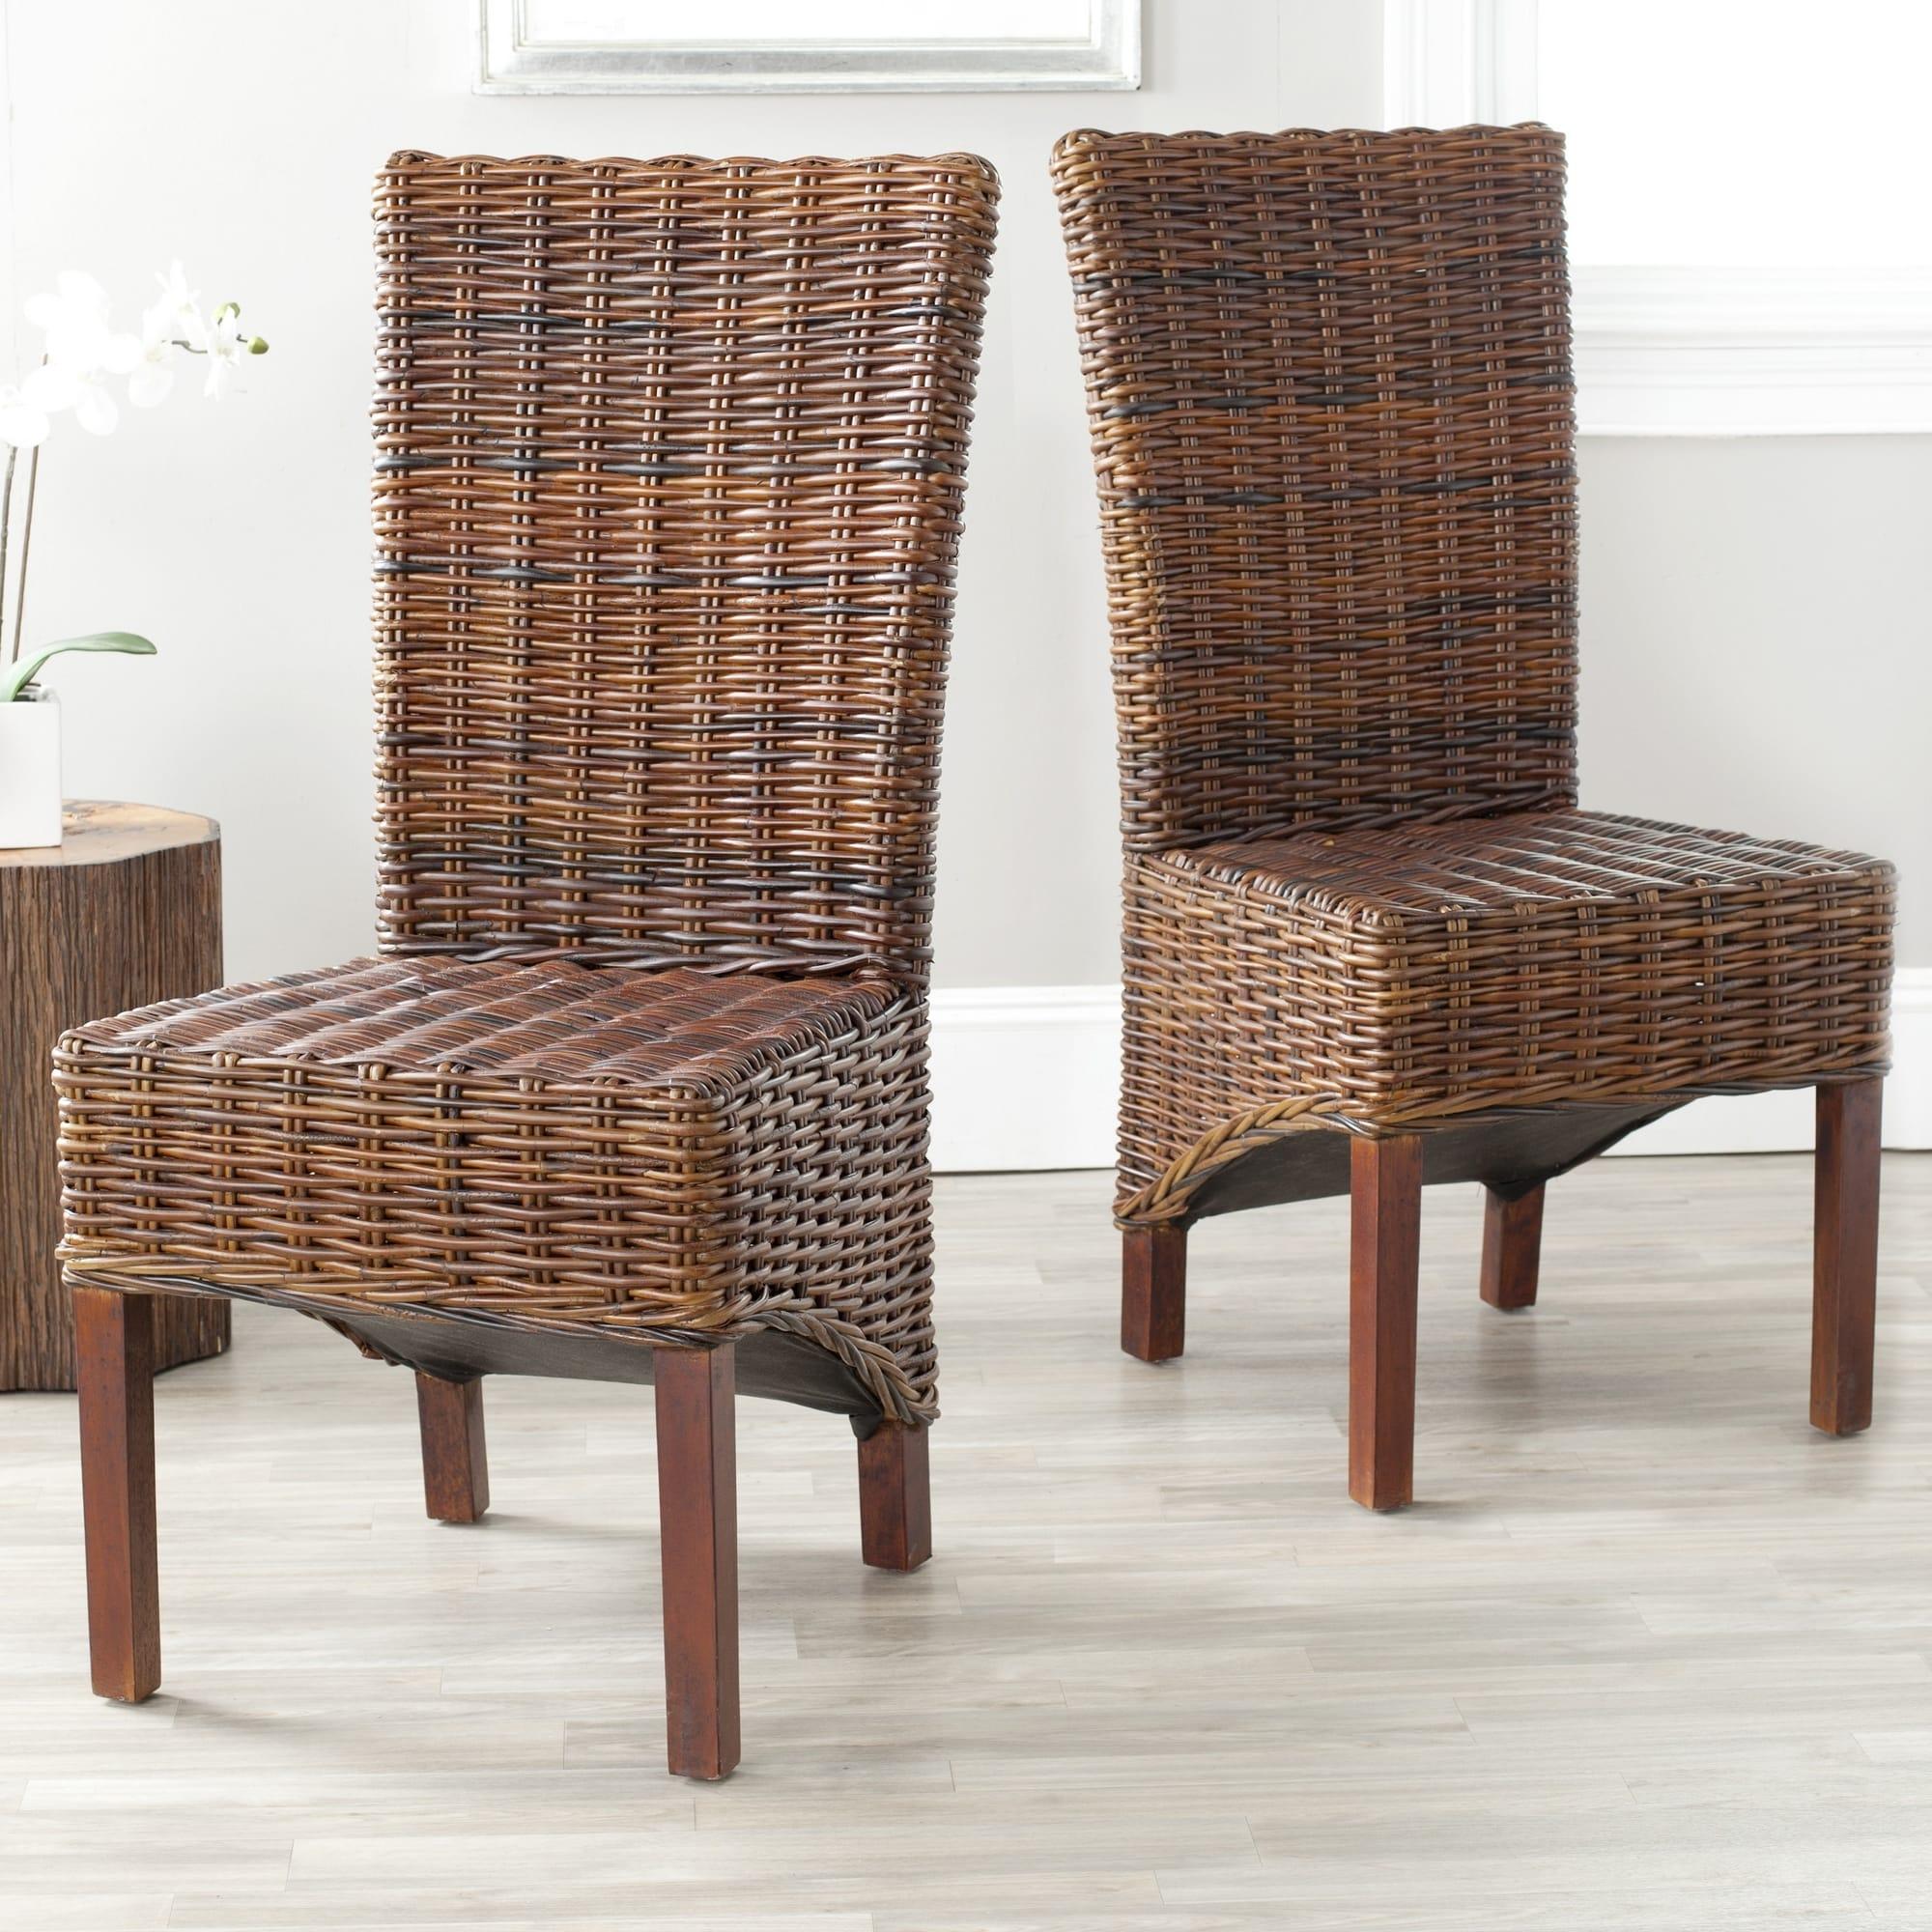 Safavieh Dining Rural Woven Ridge Dark Brown Wicker Chairs Set Of 2